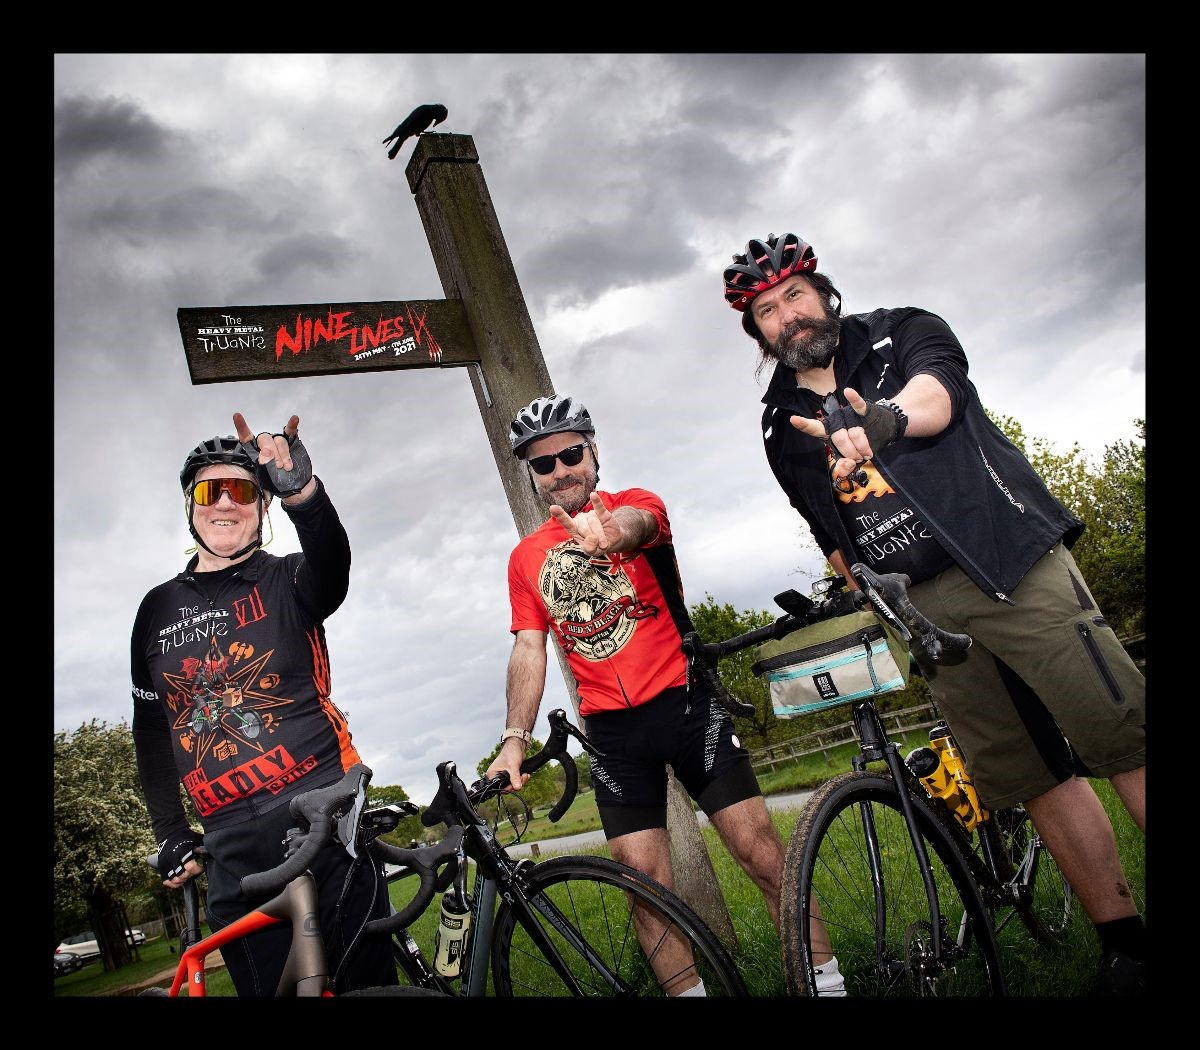 News: The Heavy Metal Truants Raise Over £1 Million For Children's Charities